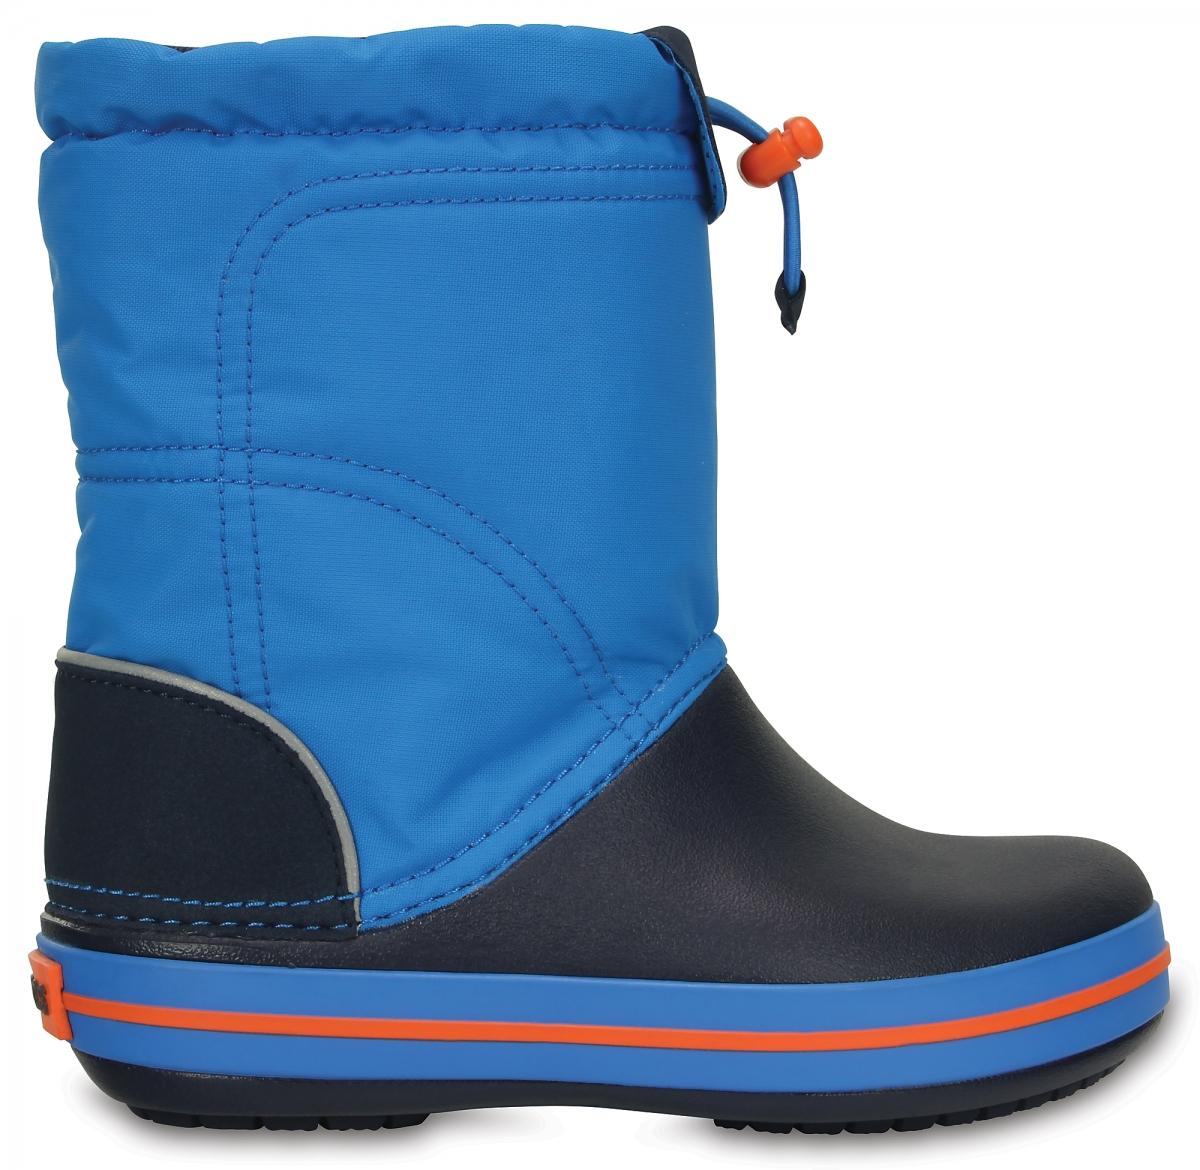 Crocs Crocband LodgePoint Boot Kids Ocean/Navy, J3 (34-35)